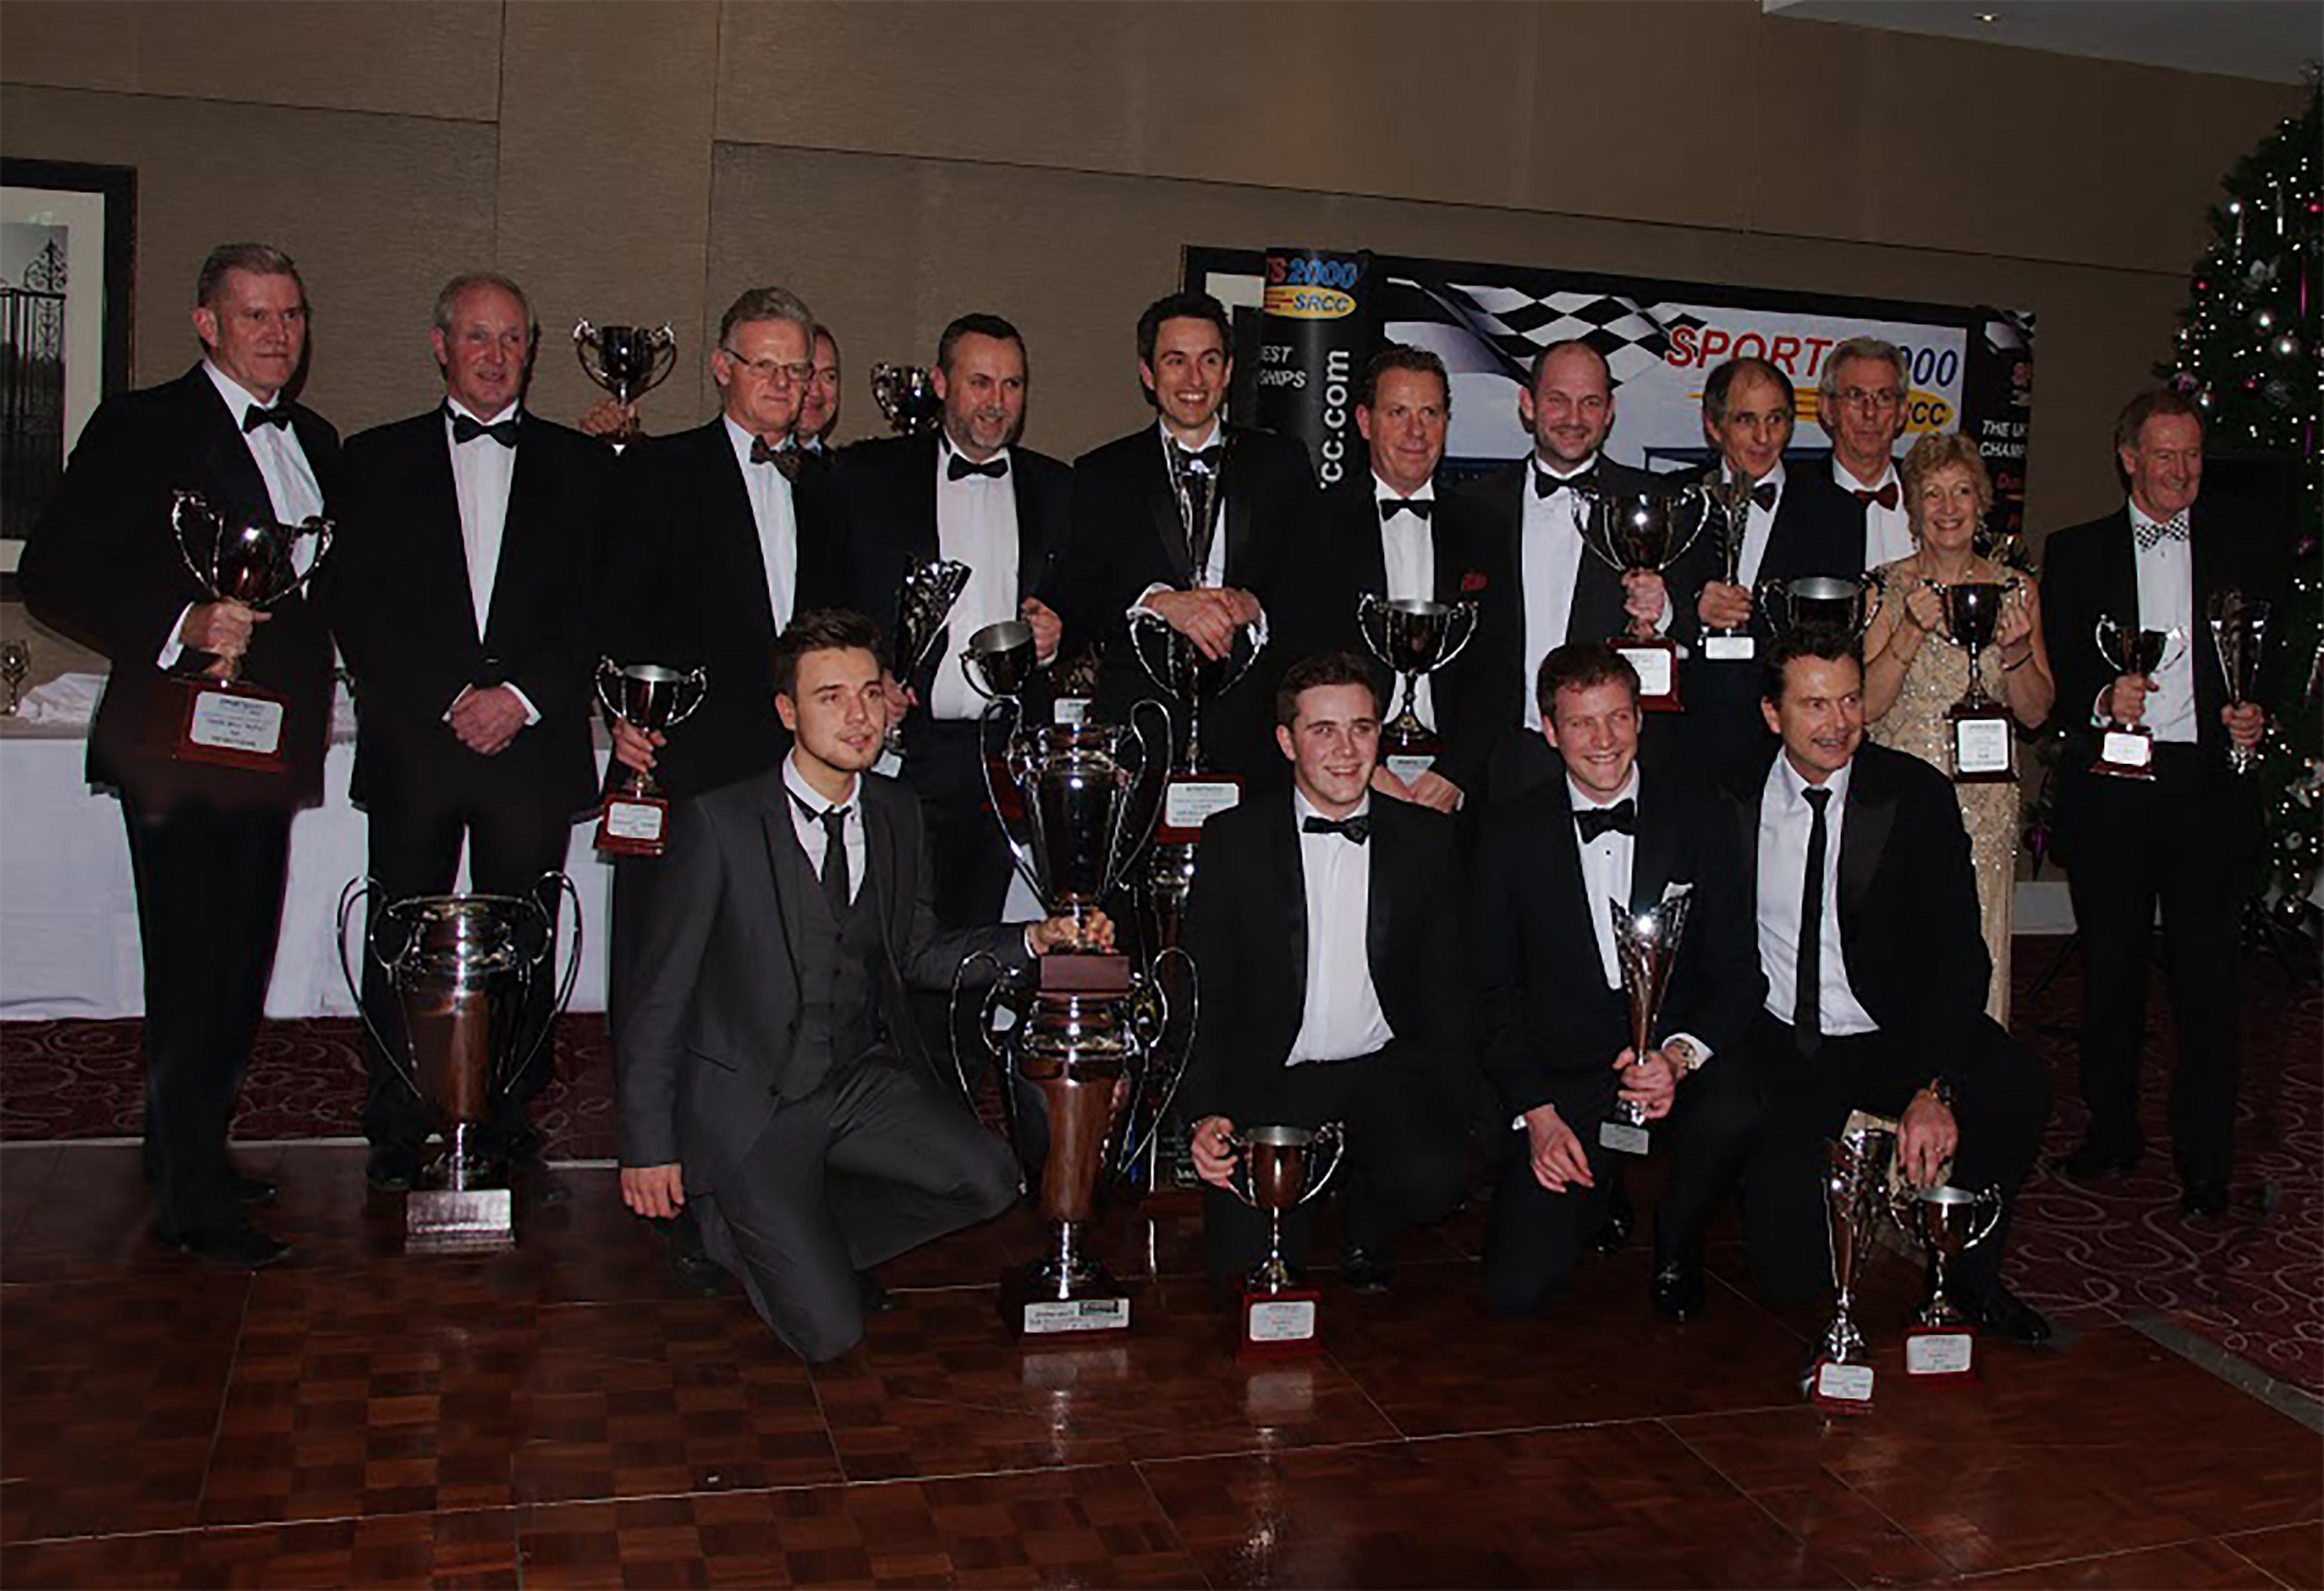 Sports 2000 awards winners 2015